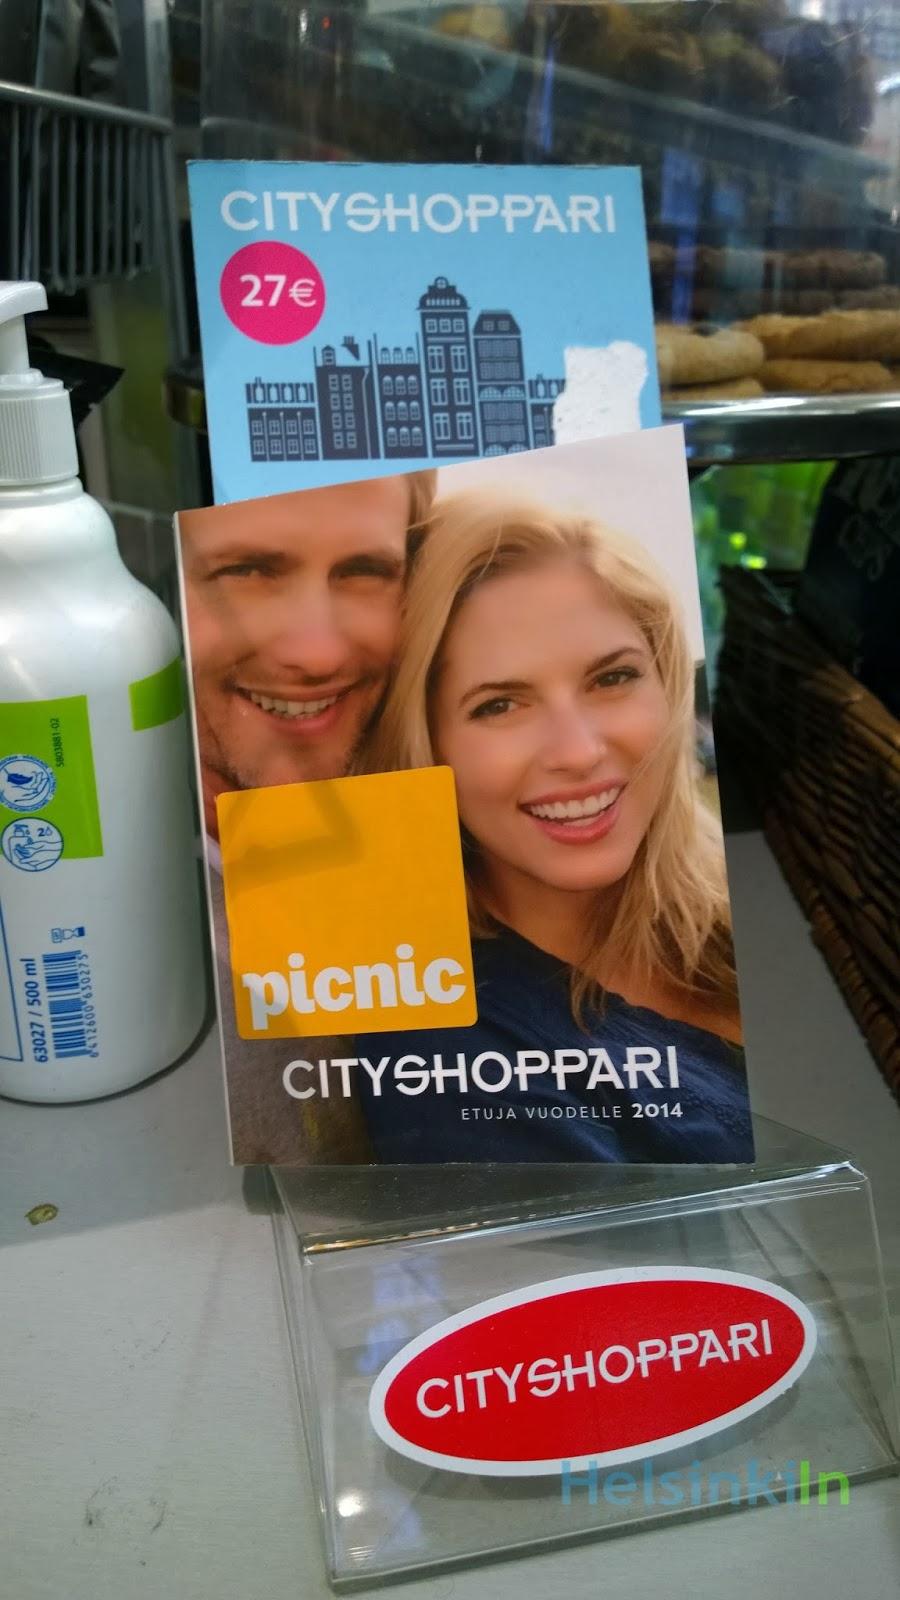 CityShoppari 2014